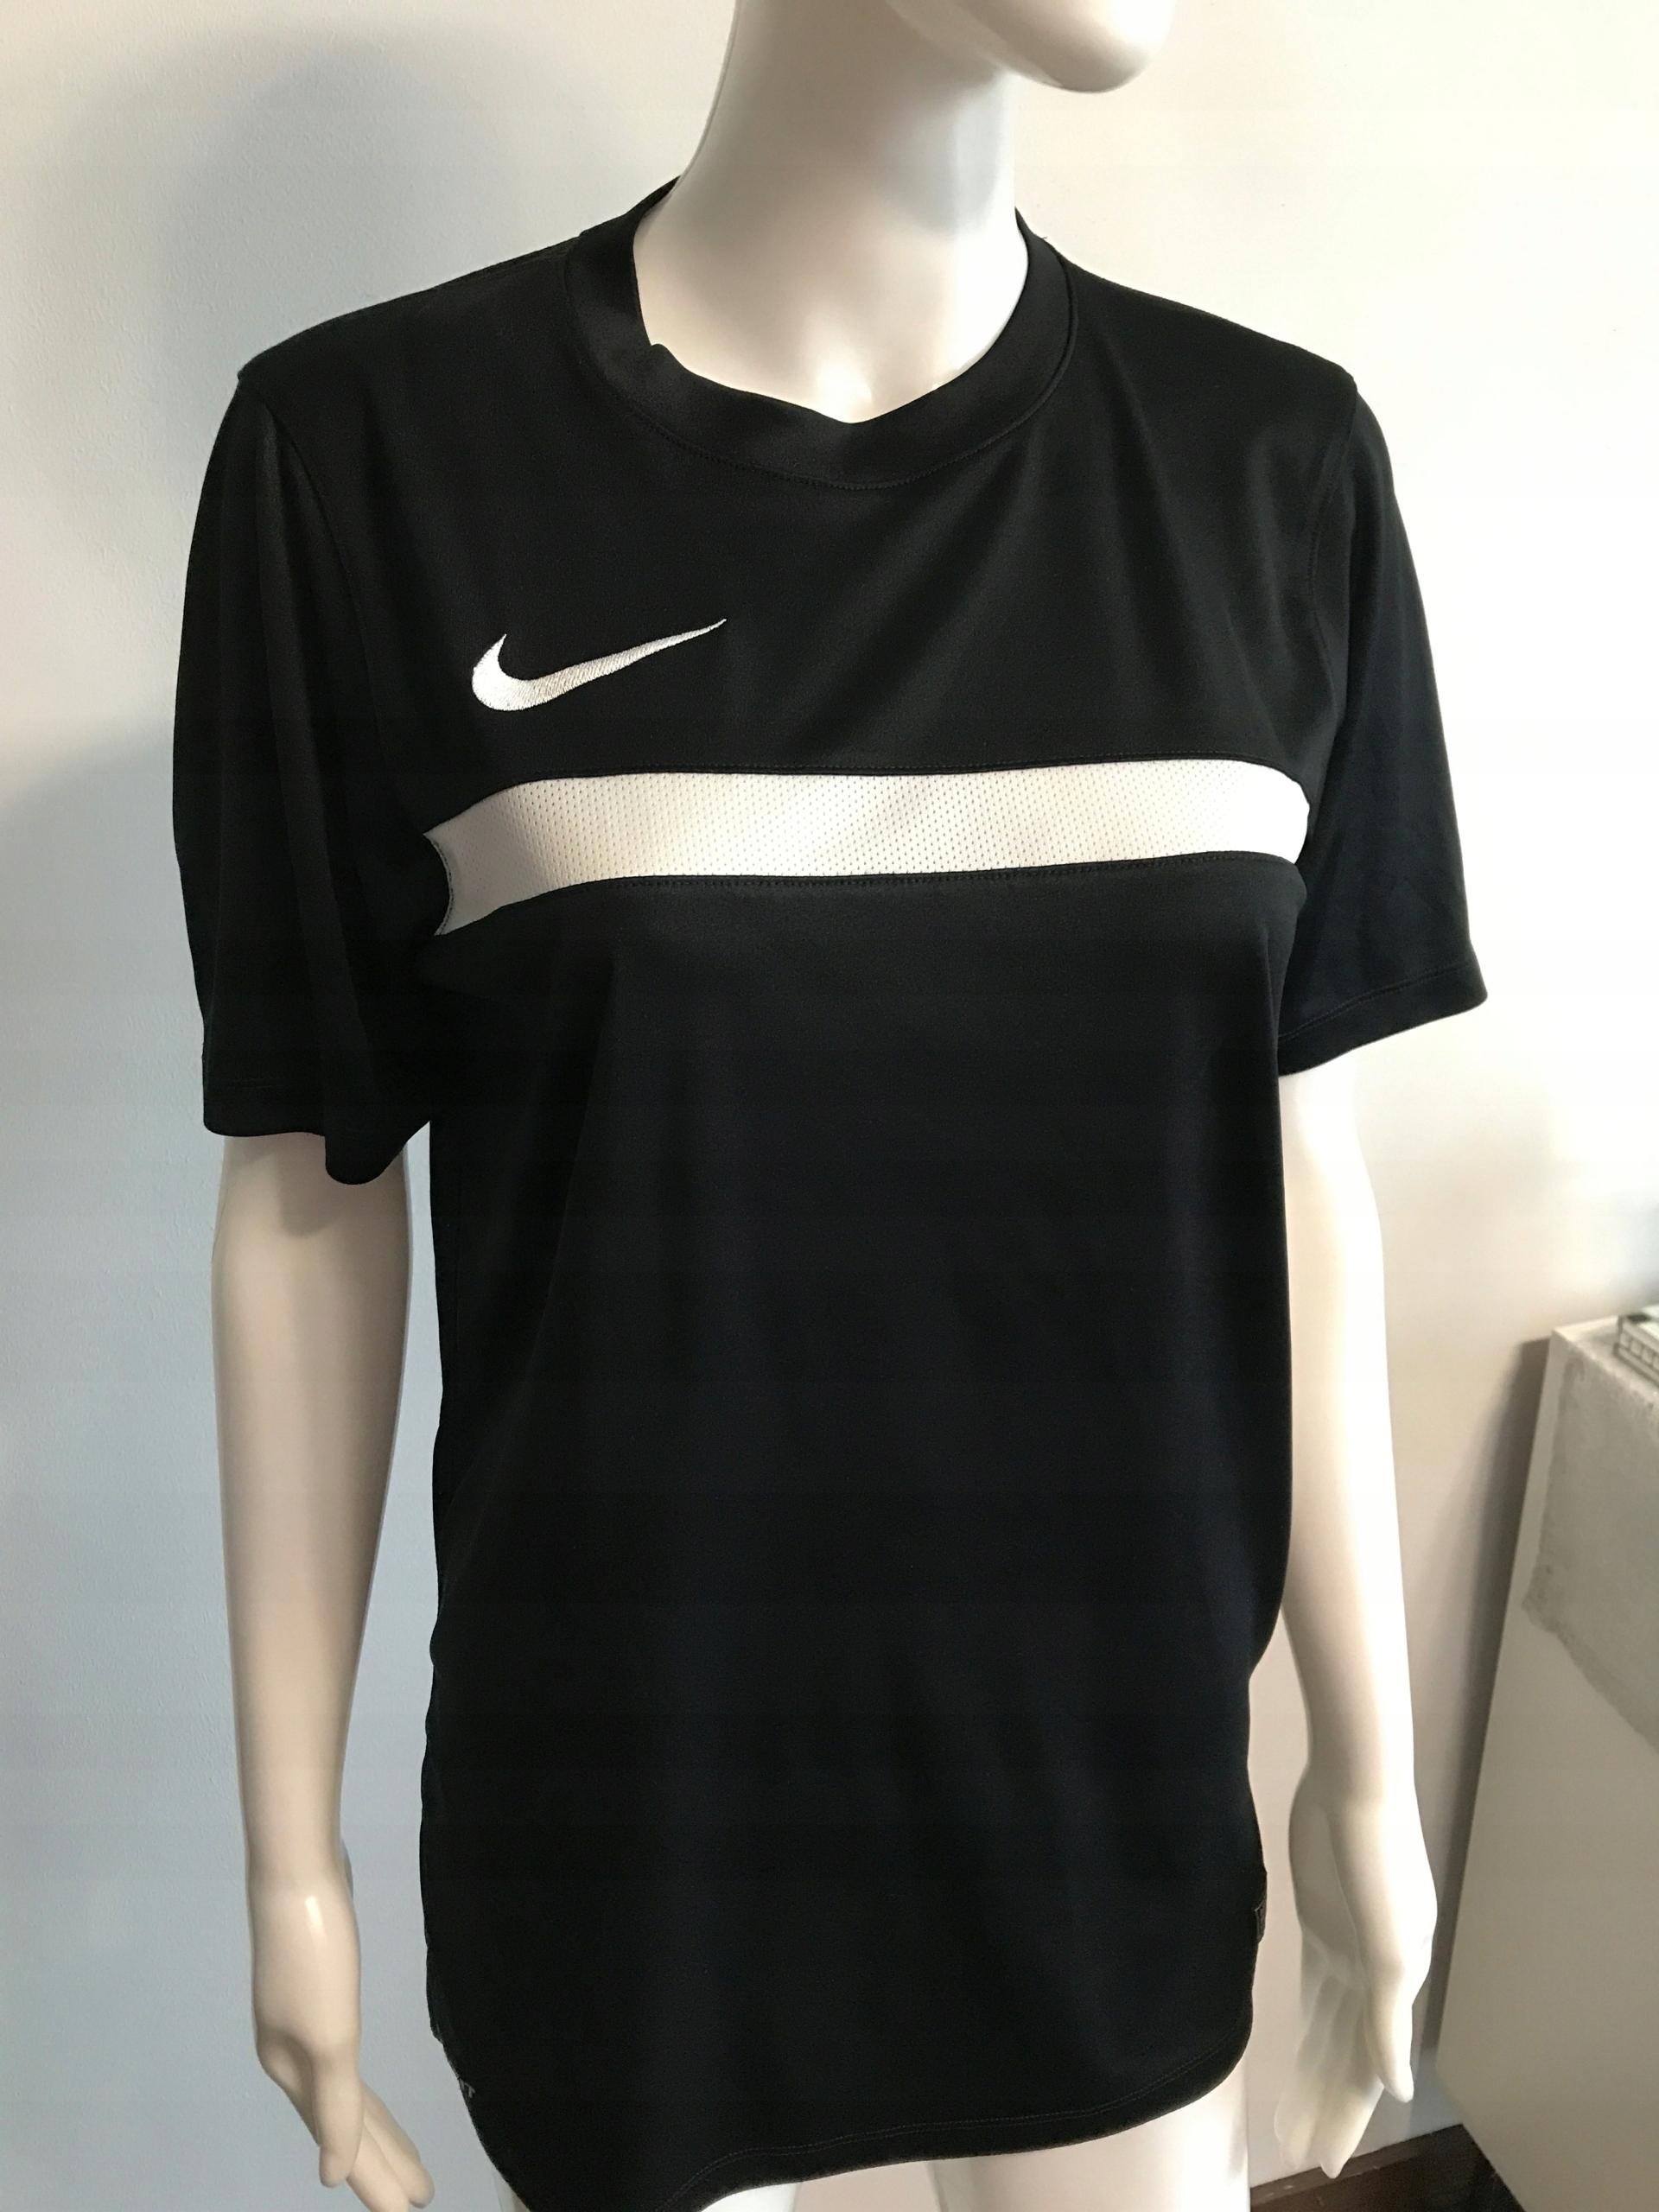 Koszulka Tshirt Nike 38 M damska 7459342996 oficjalne